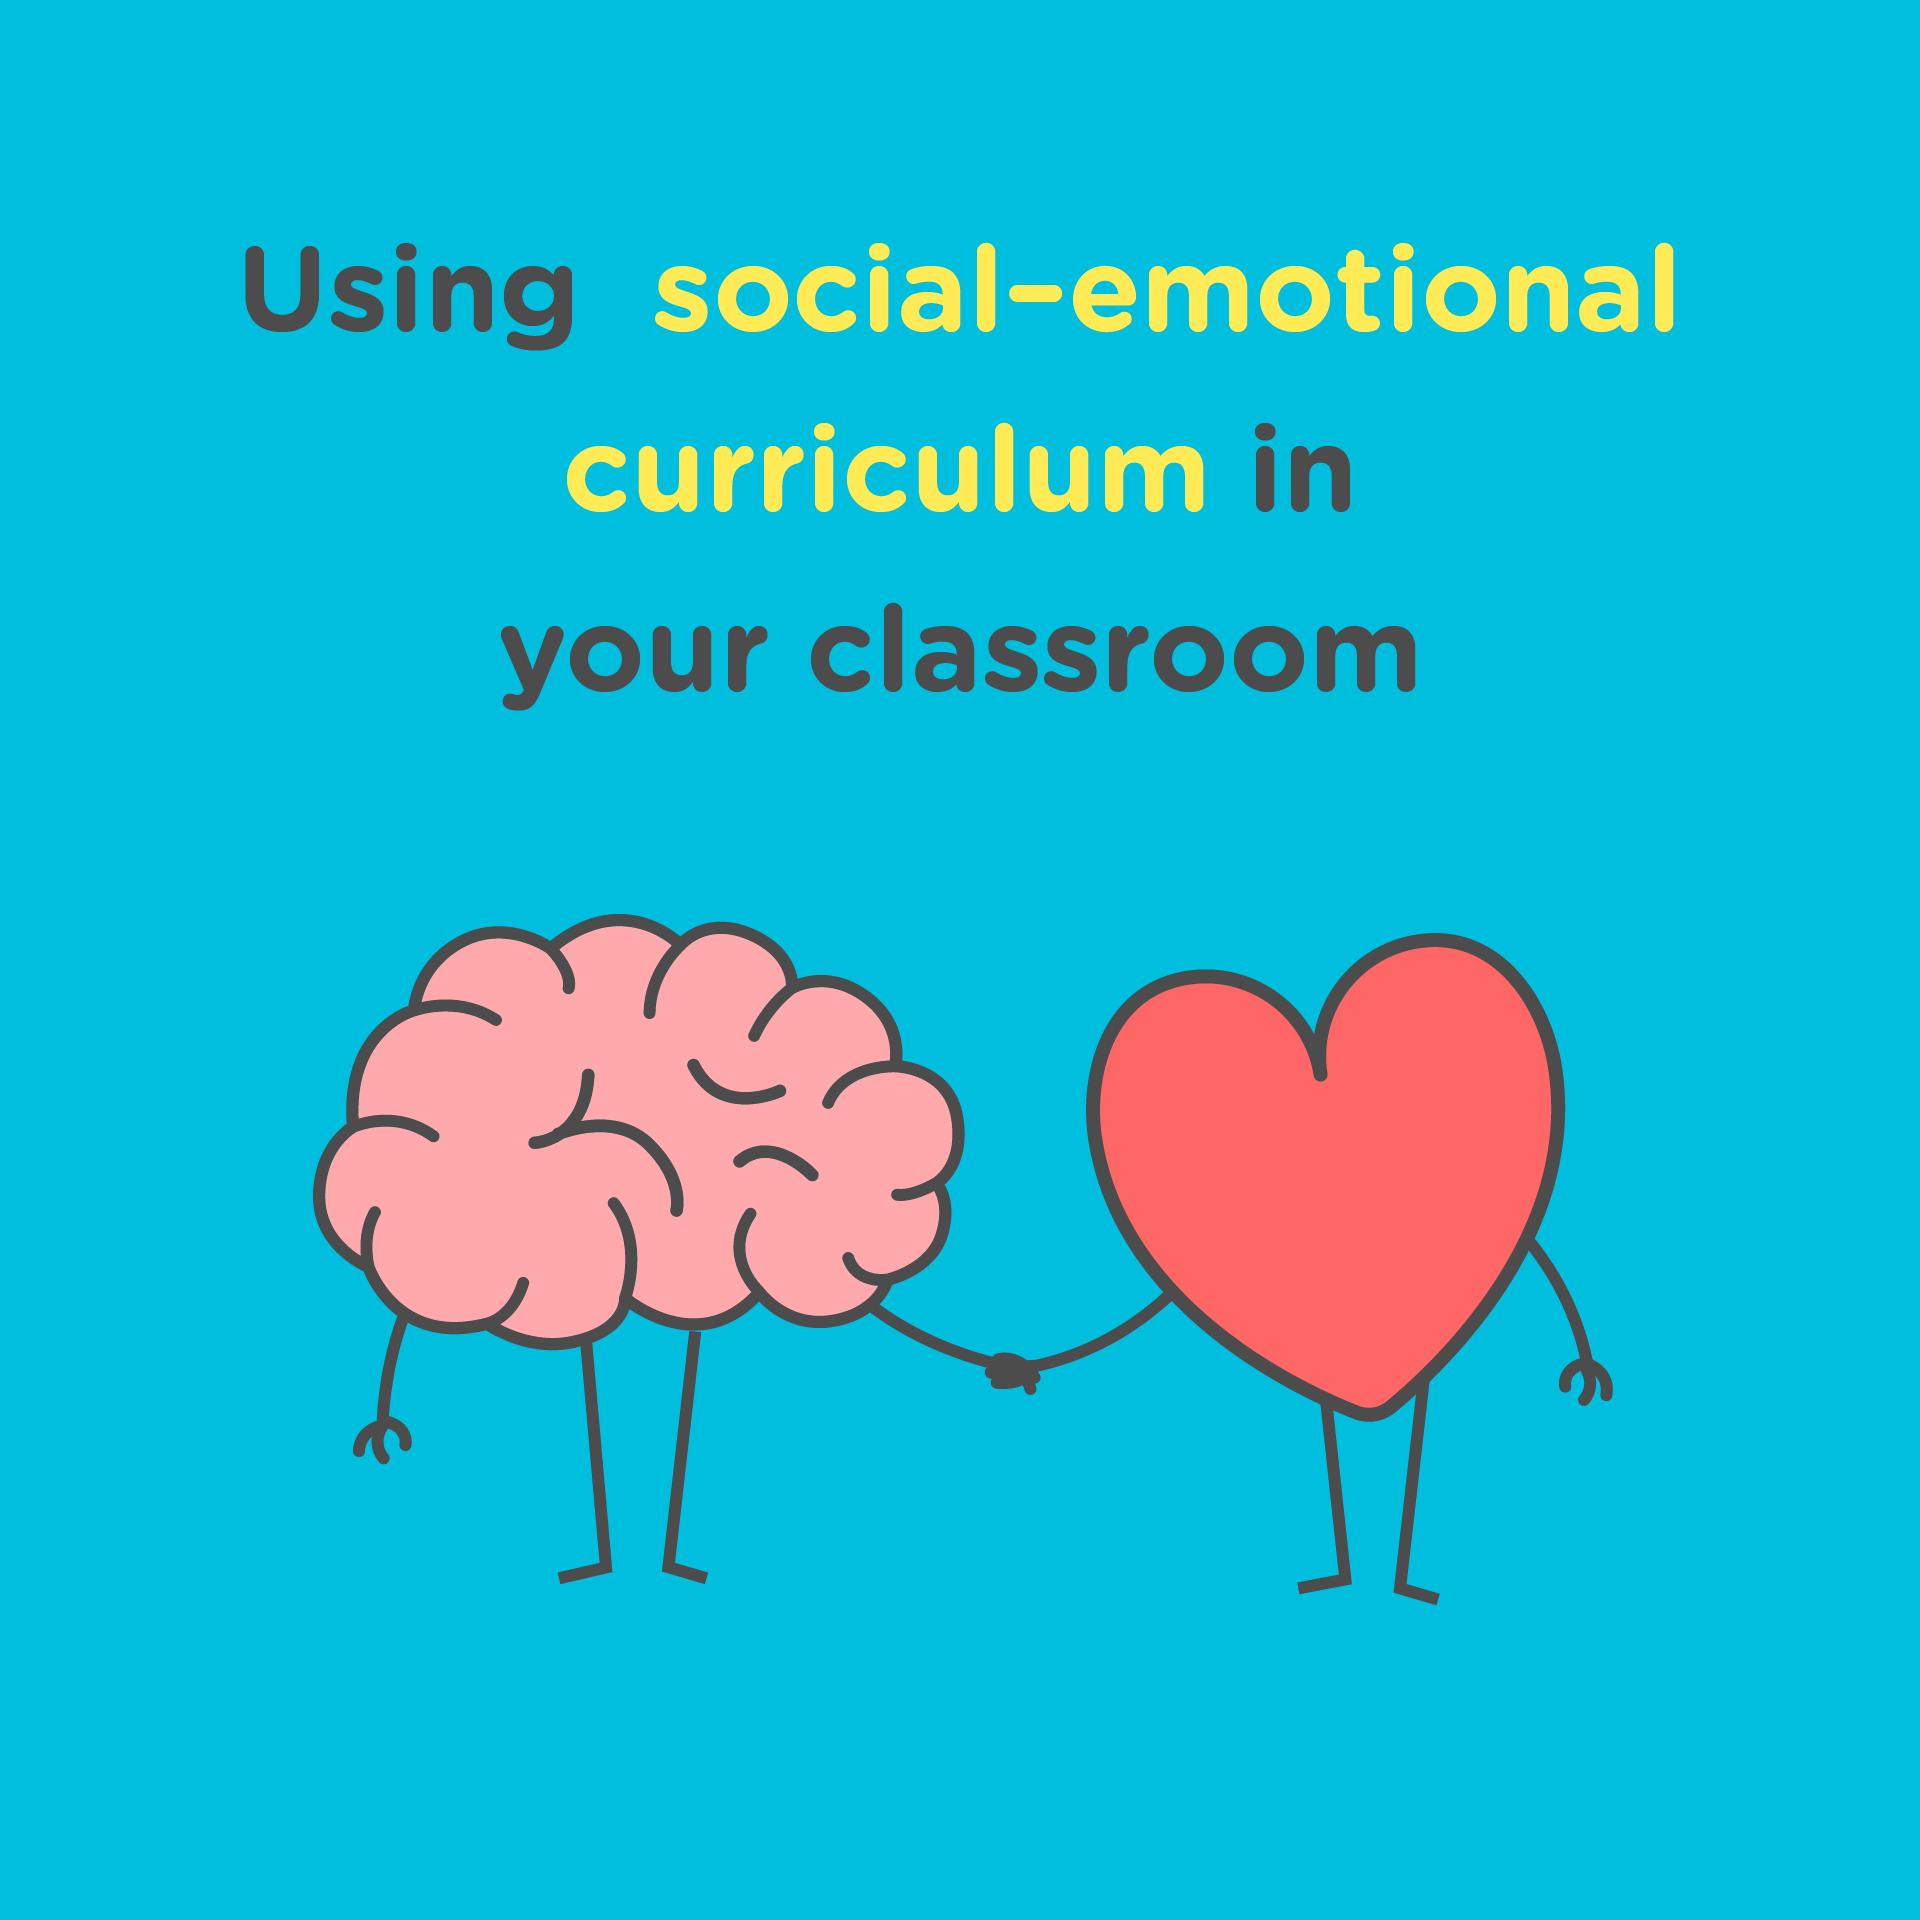 Social-emotional curriculum